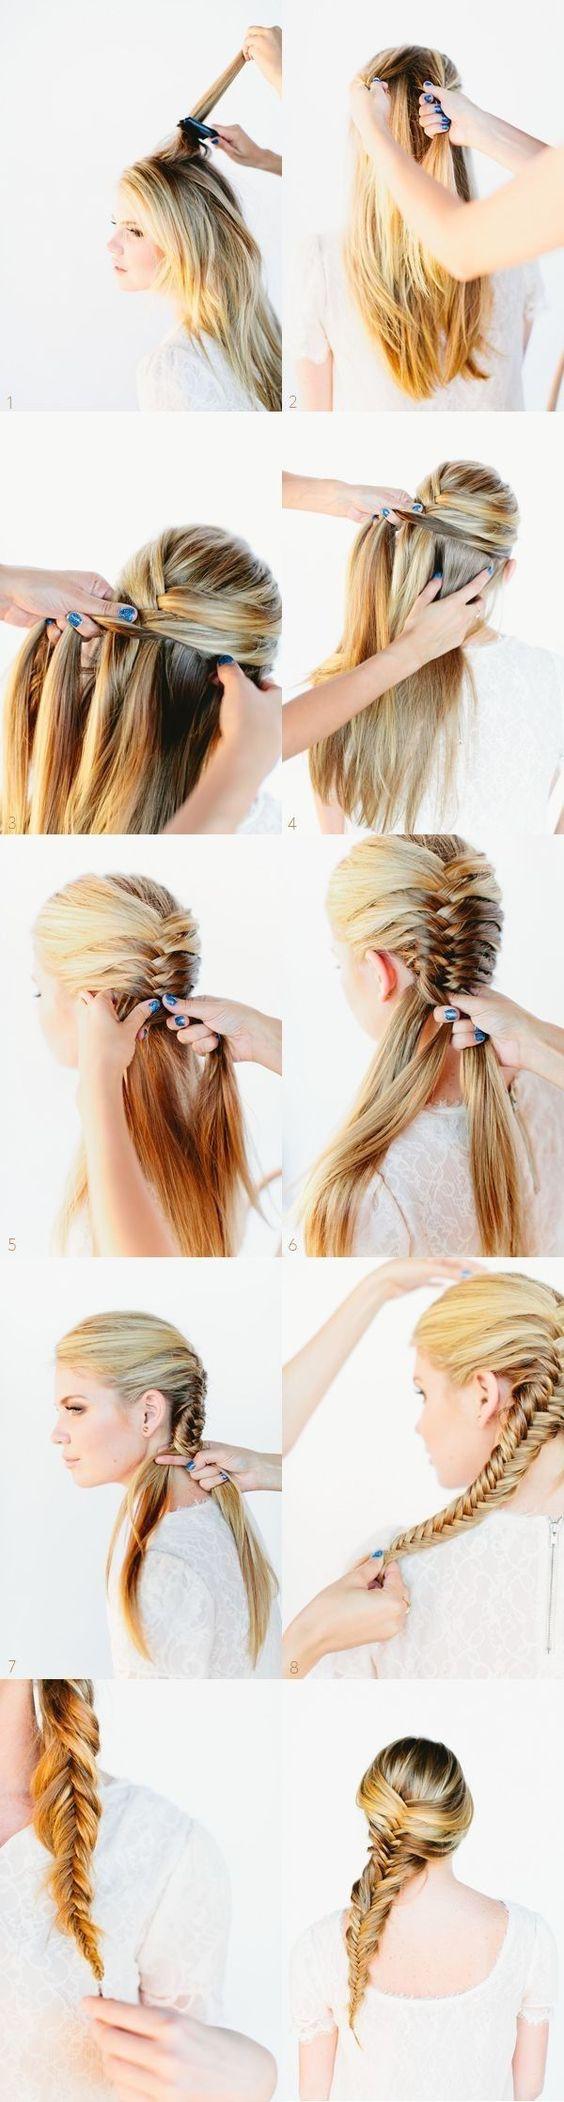 DIY – Frozen Elsa's Braid – Fish Braid – Step By Step Hair Tutorial